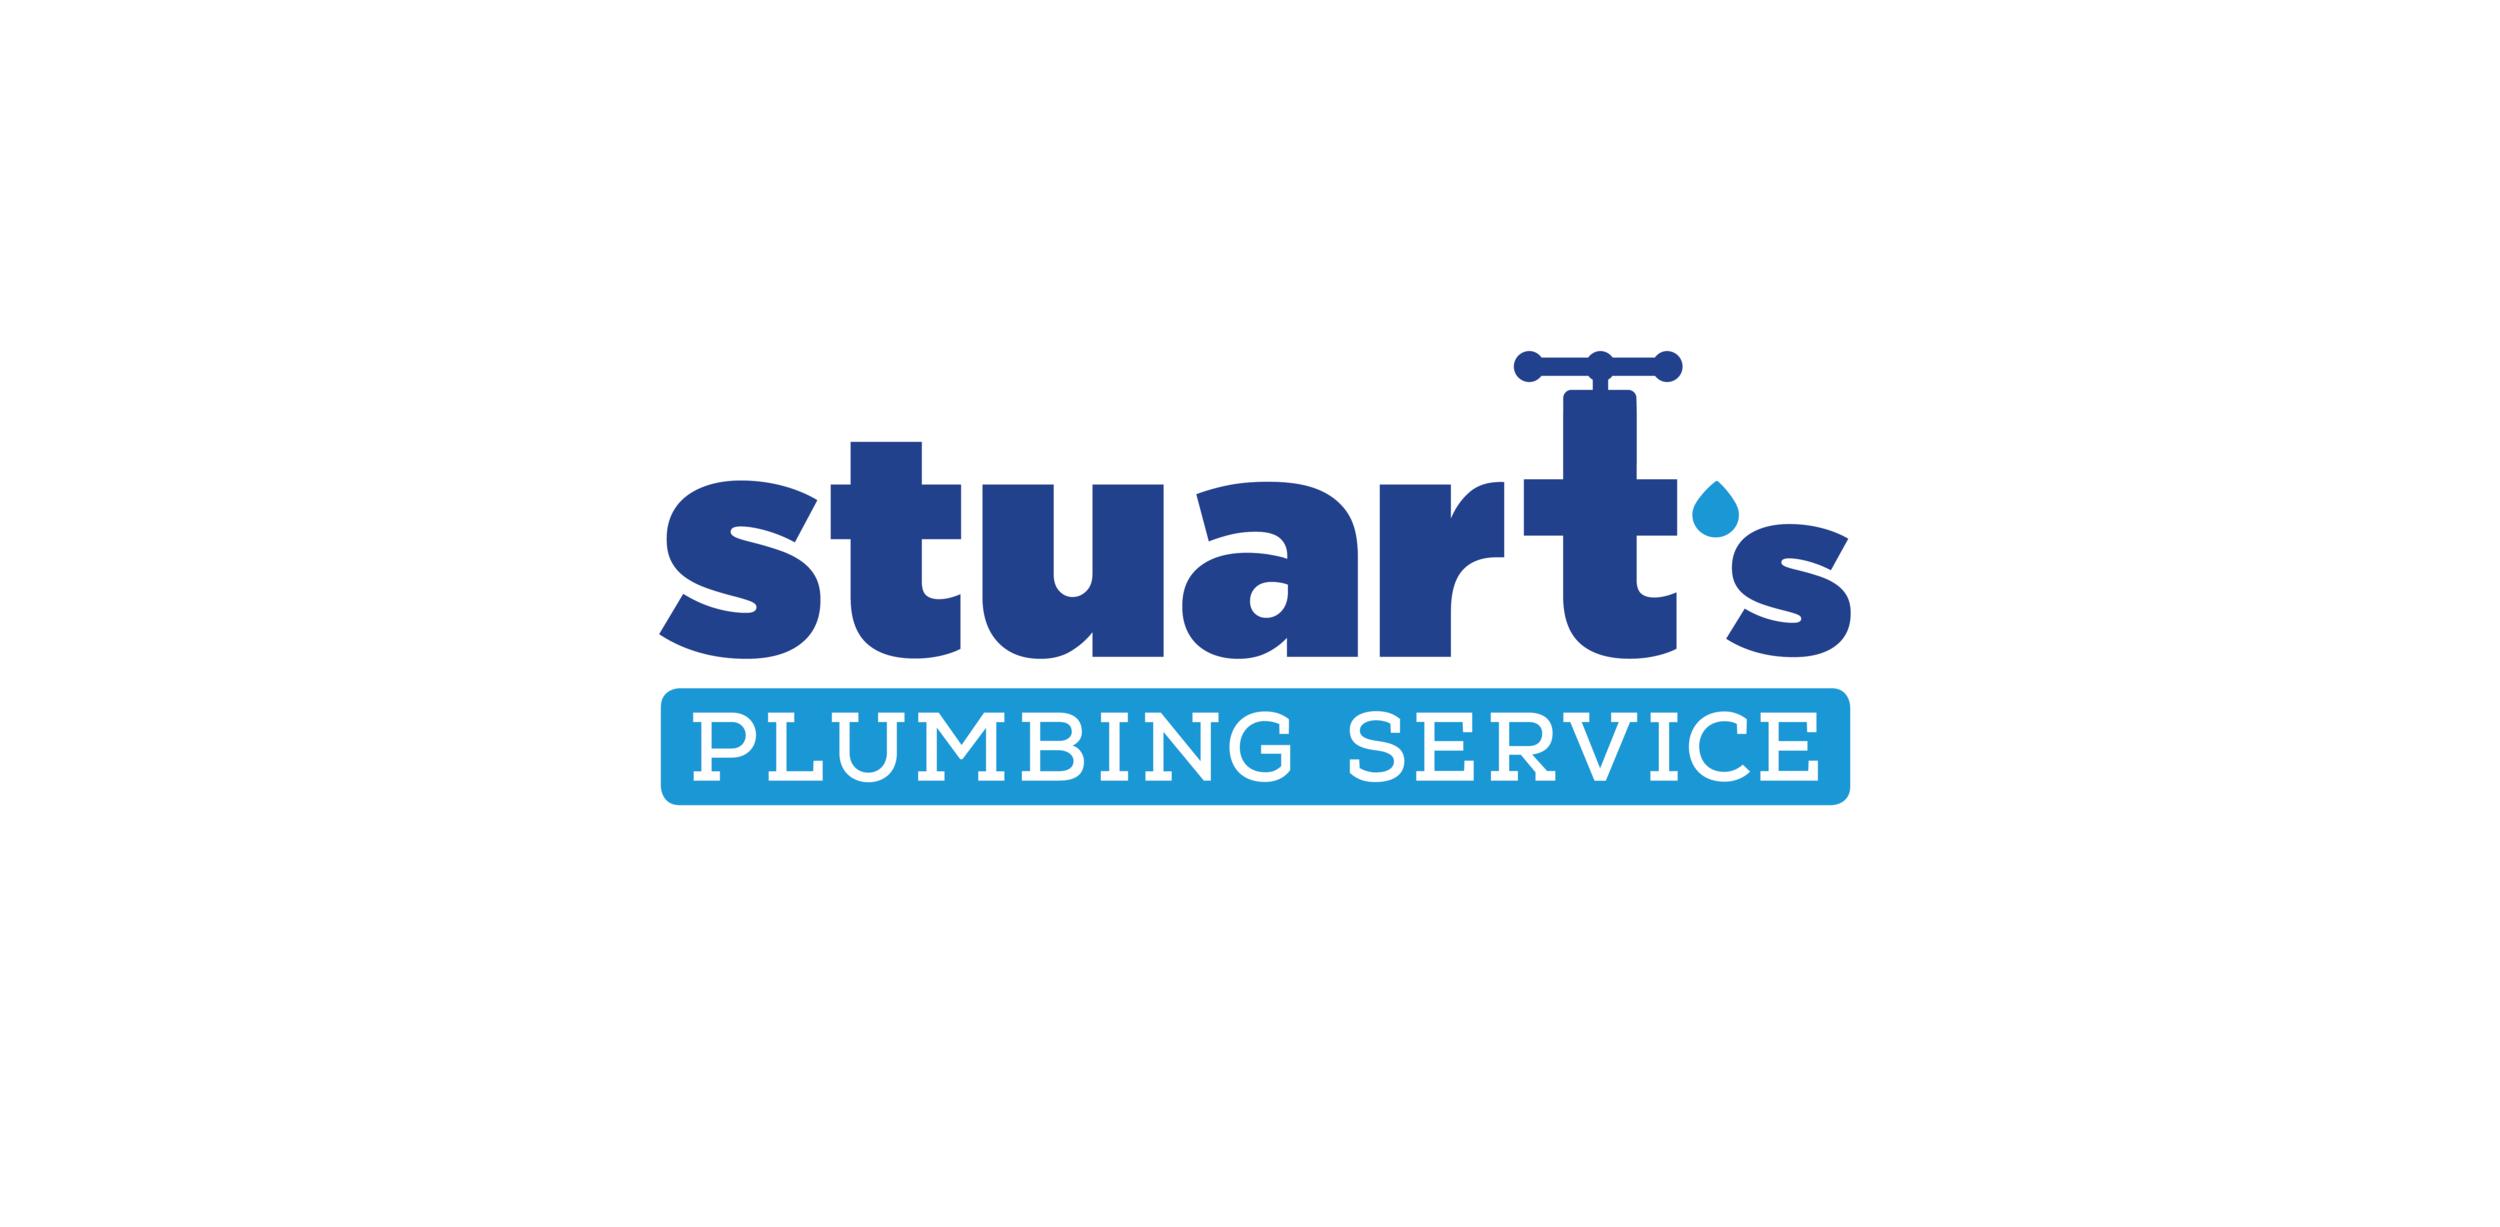 StuartsPlumbingService-4C.png